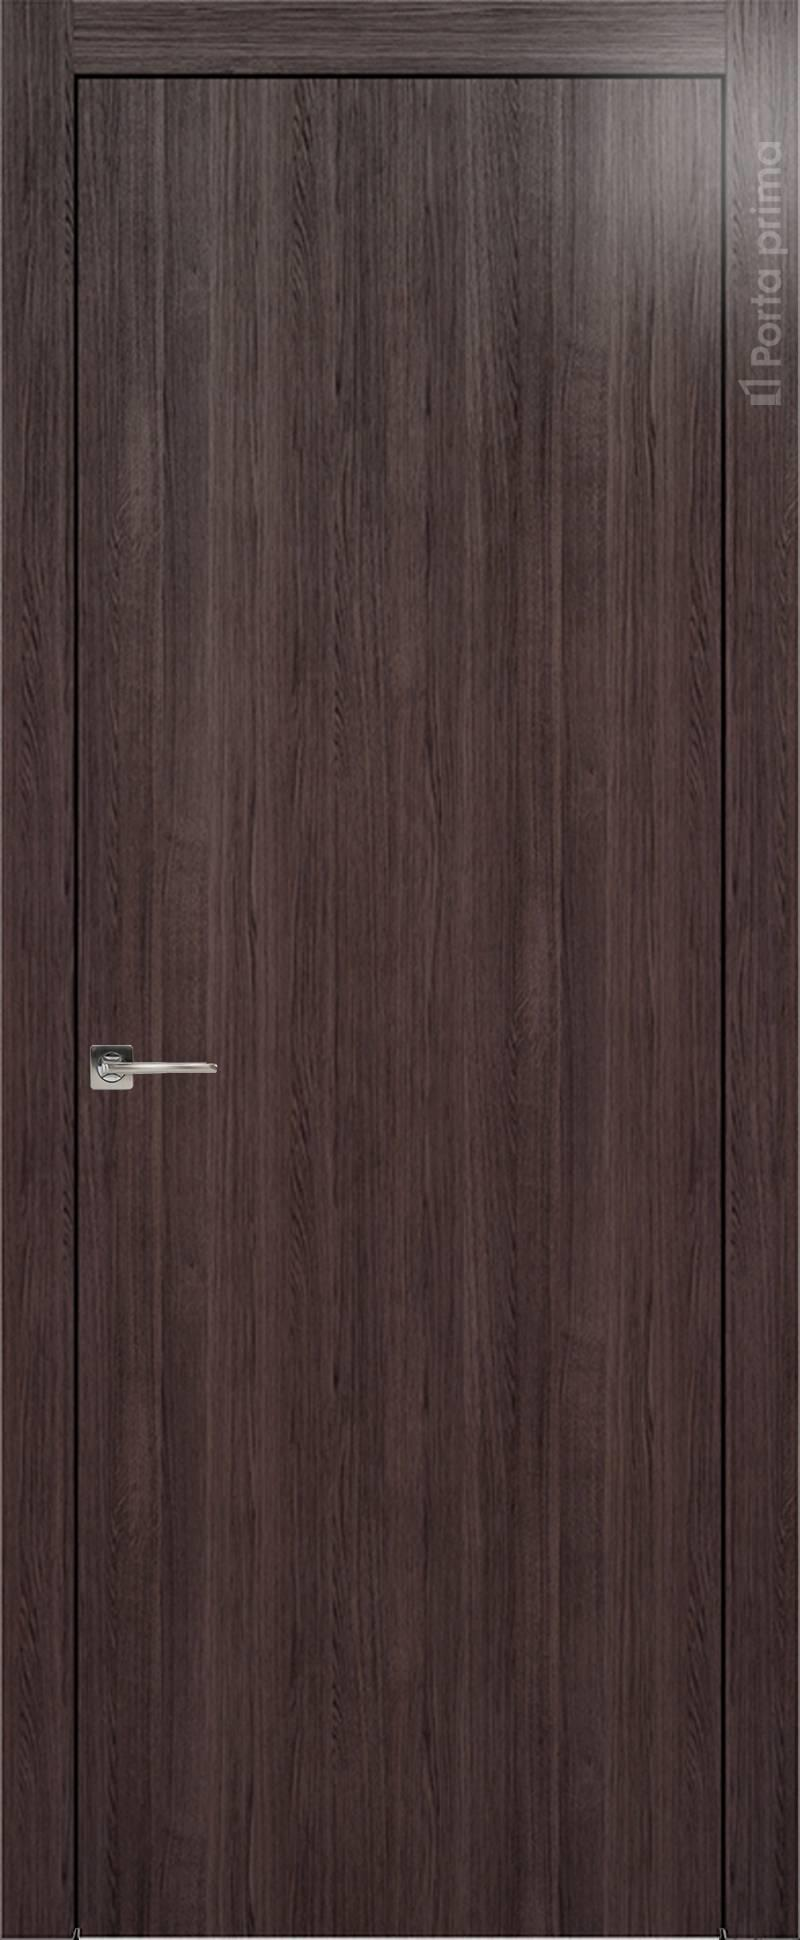 Tivoli А-1 цвет - Венге Нуар Без стекла (ДГ)